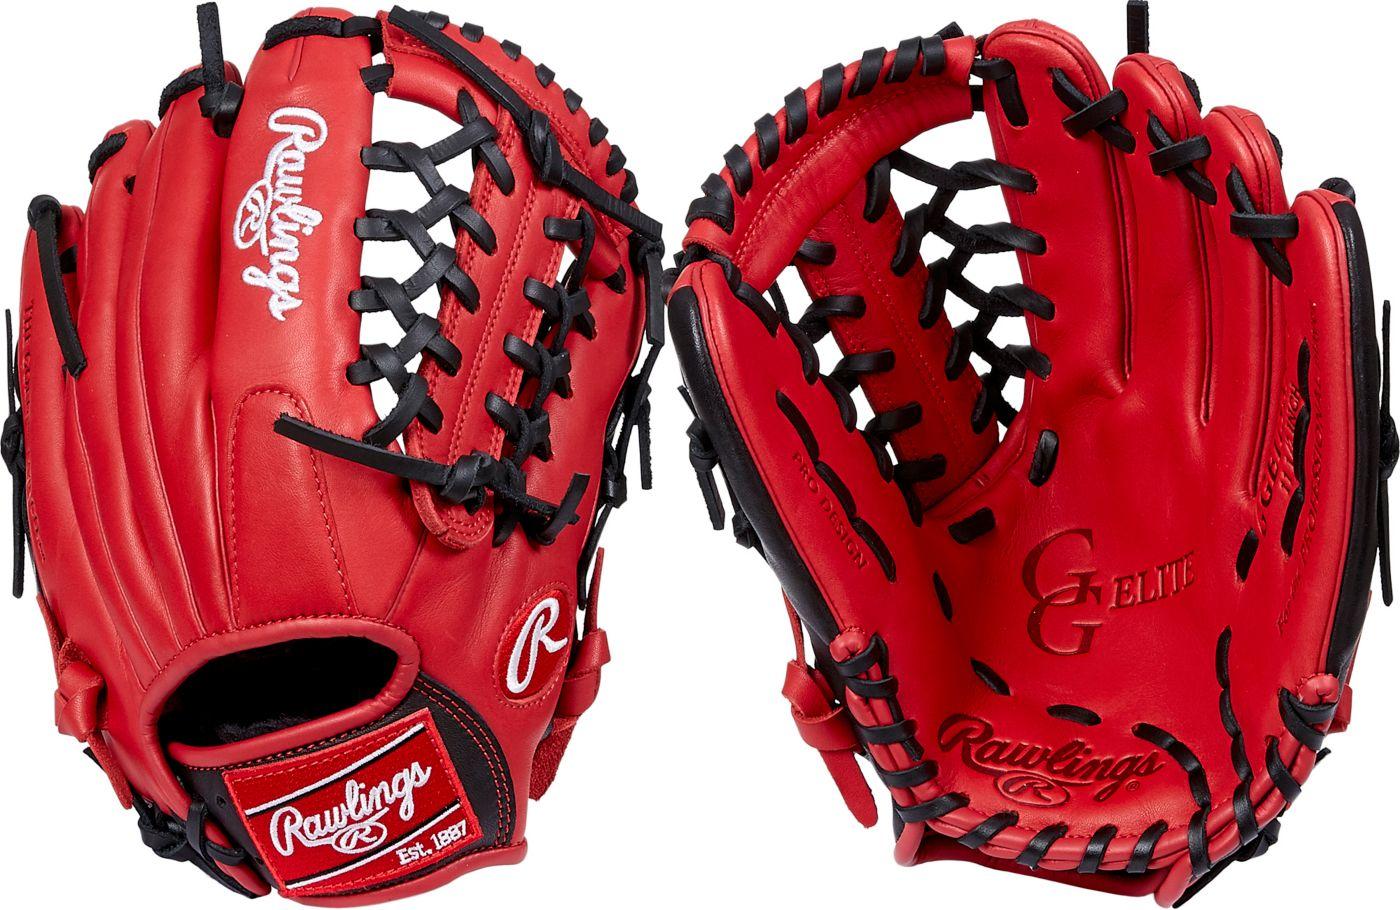 Rawlings 11.5'' Youth GG Elite Series Glove